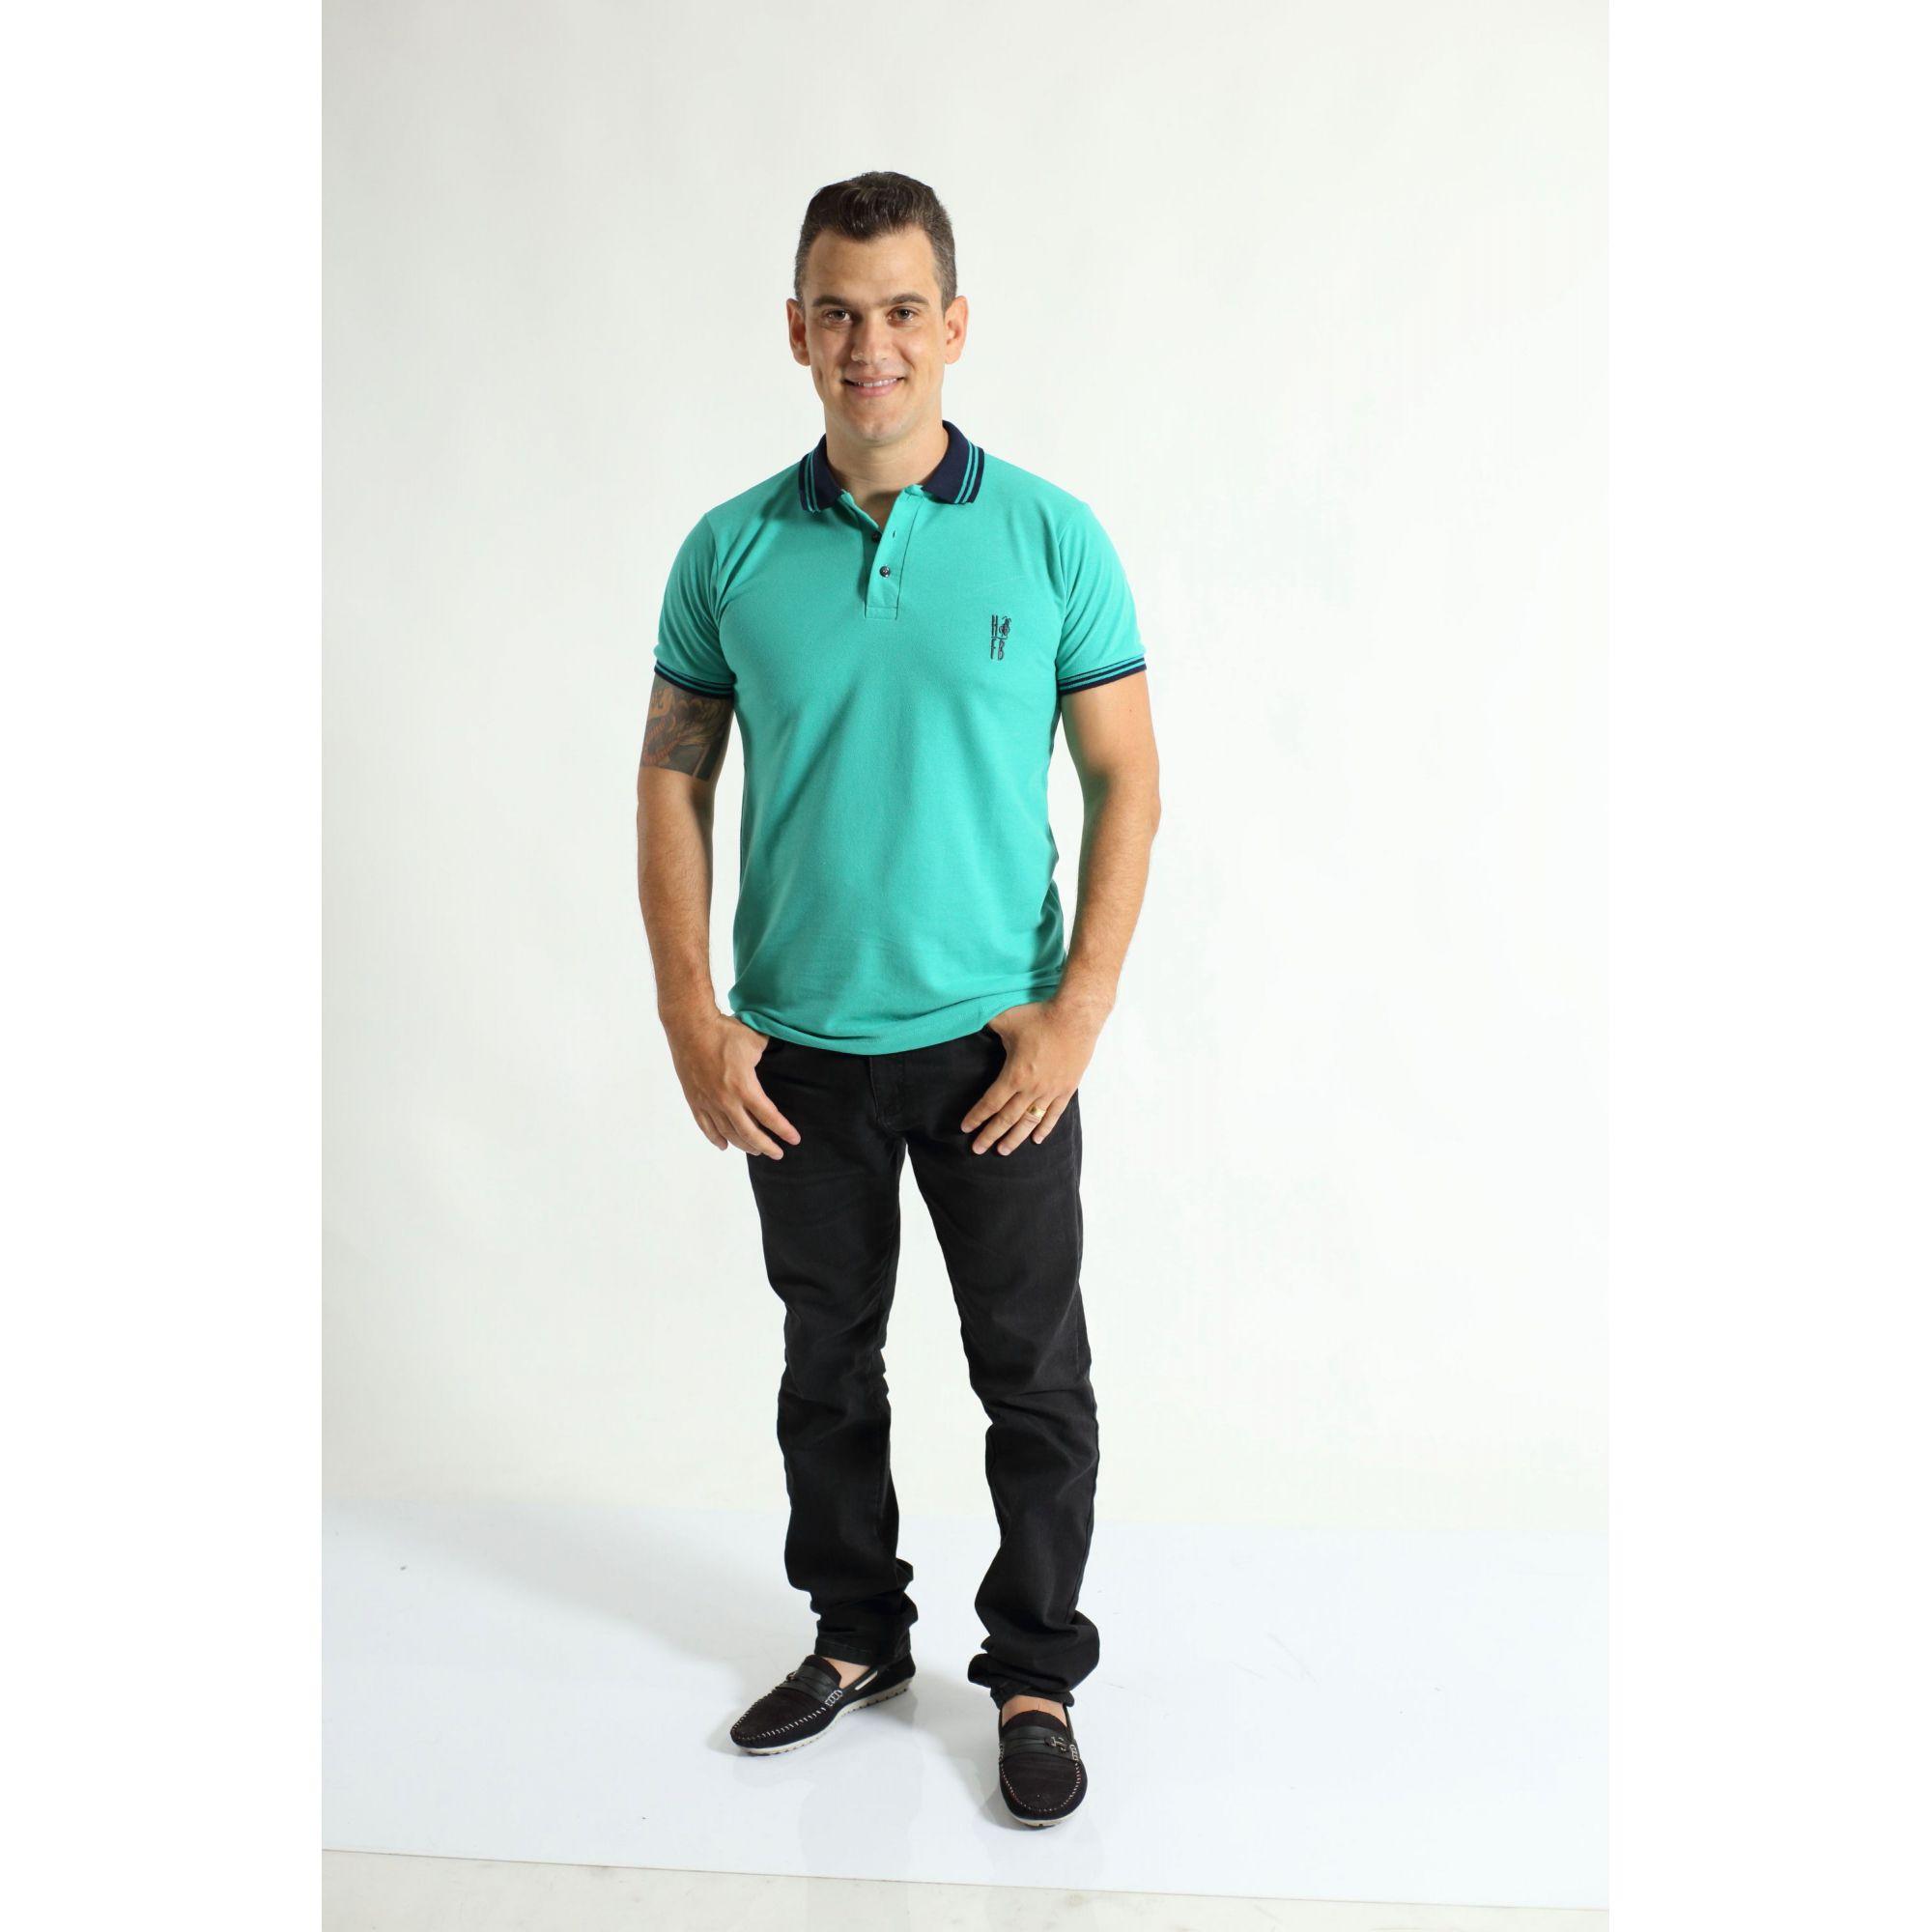 Camisa Polo Verde Jade  - Heitor Fashion Brazil